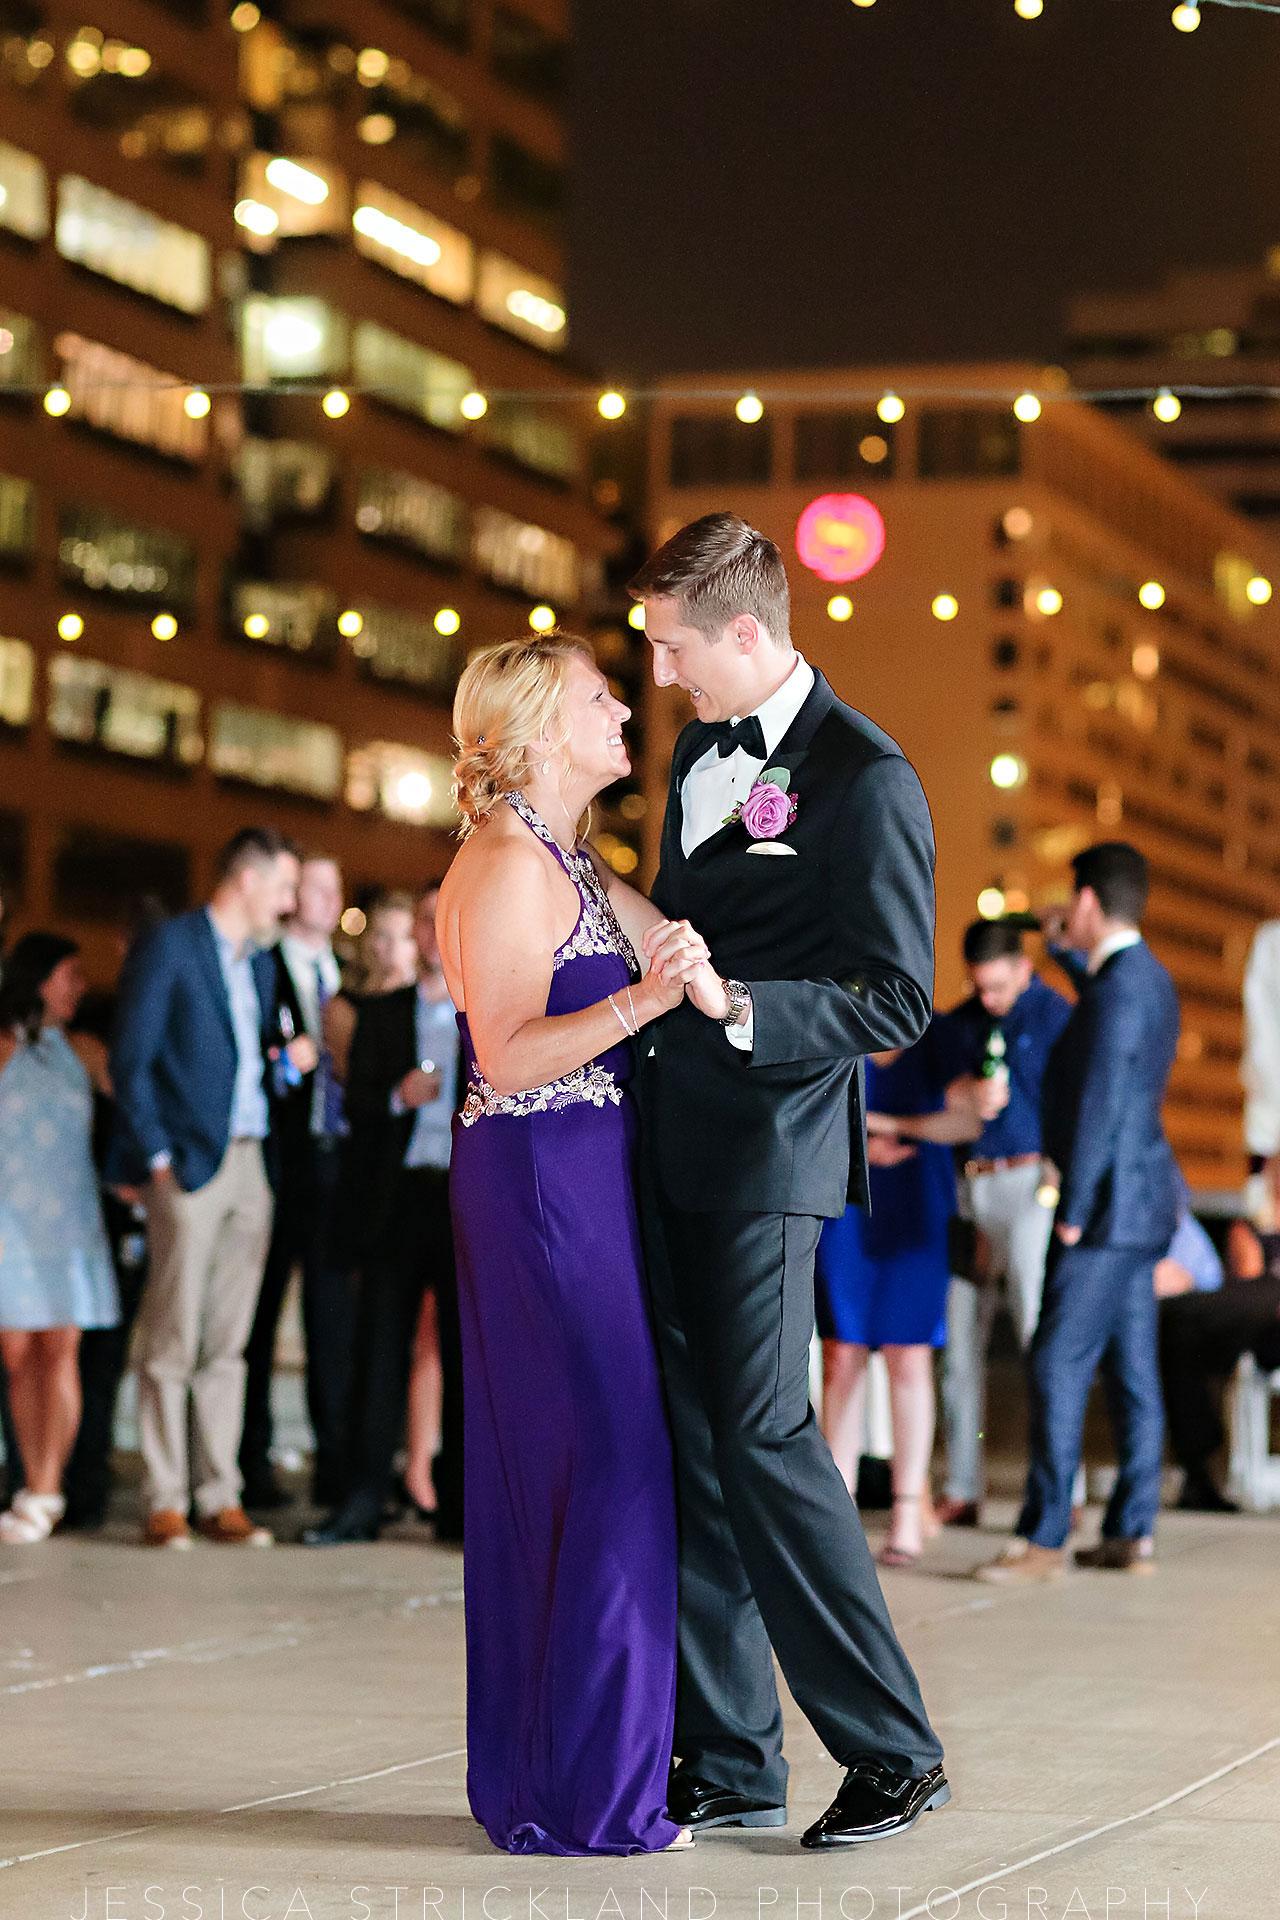 Serra Alex Regions Tower Indianapolis Wedding 366 watermarked